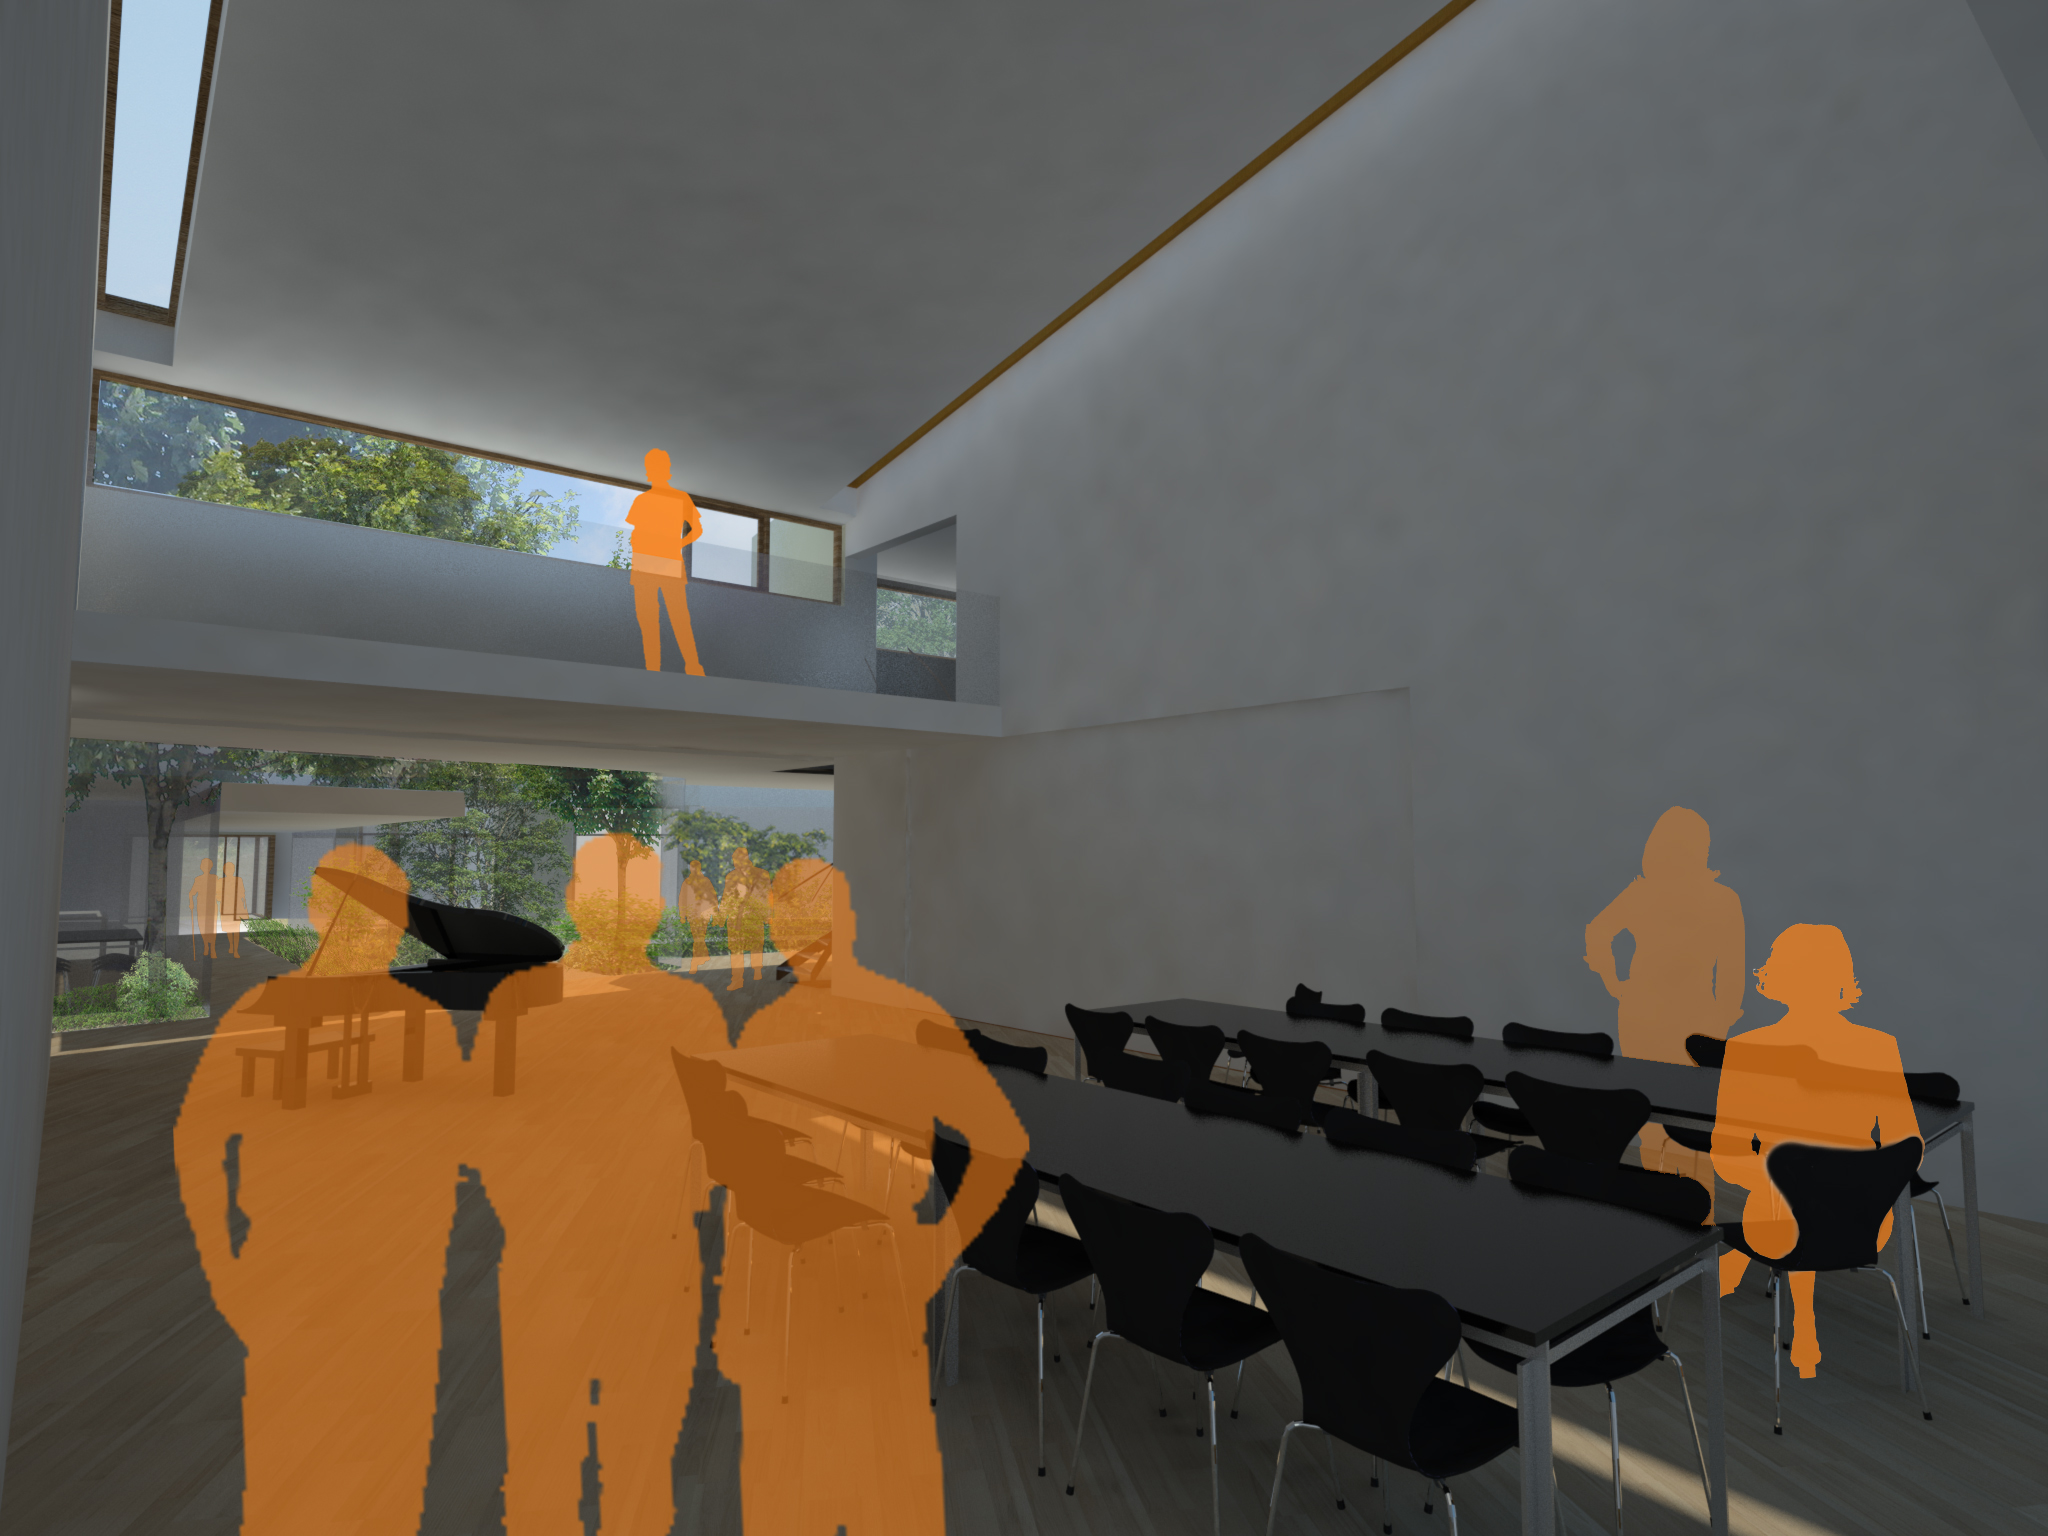 090527_Cafeen_fra_vinduet_mod_dagscenter_copy.jpg